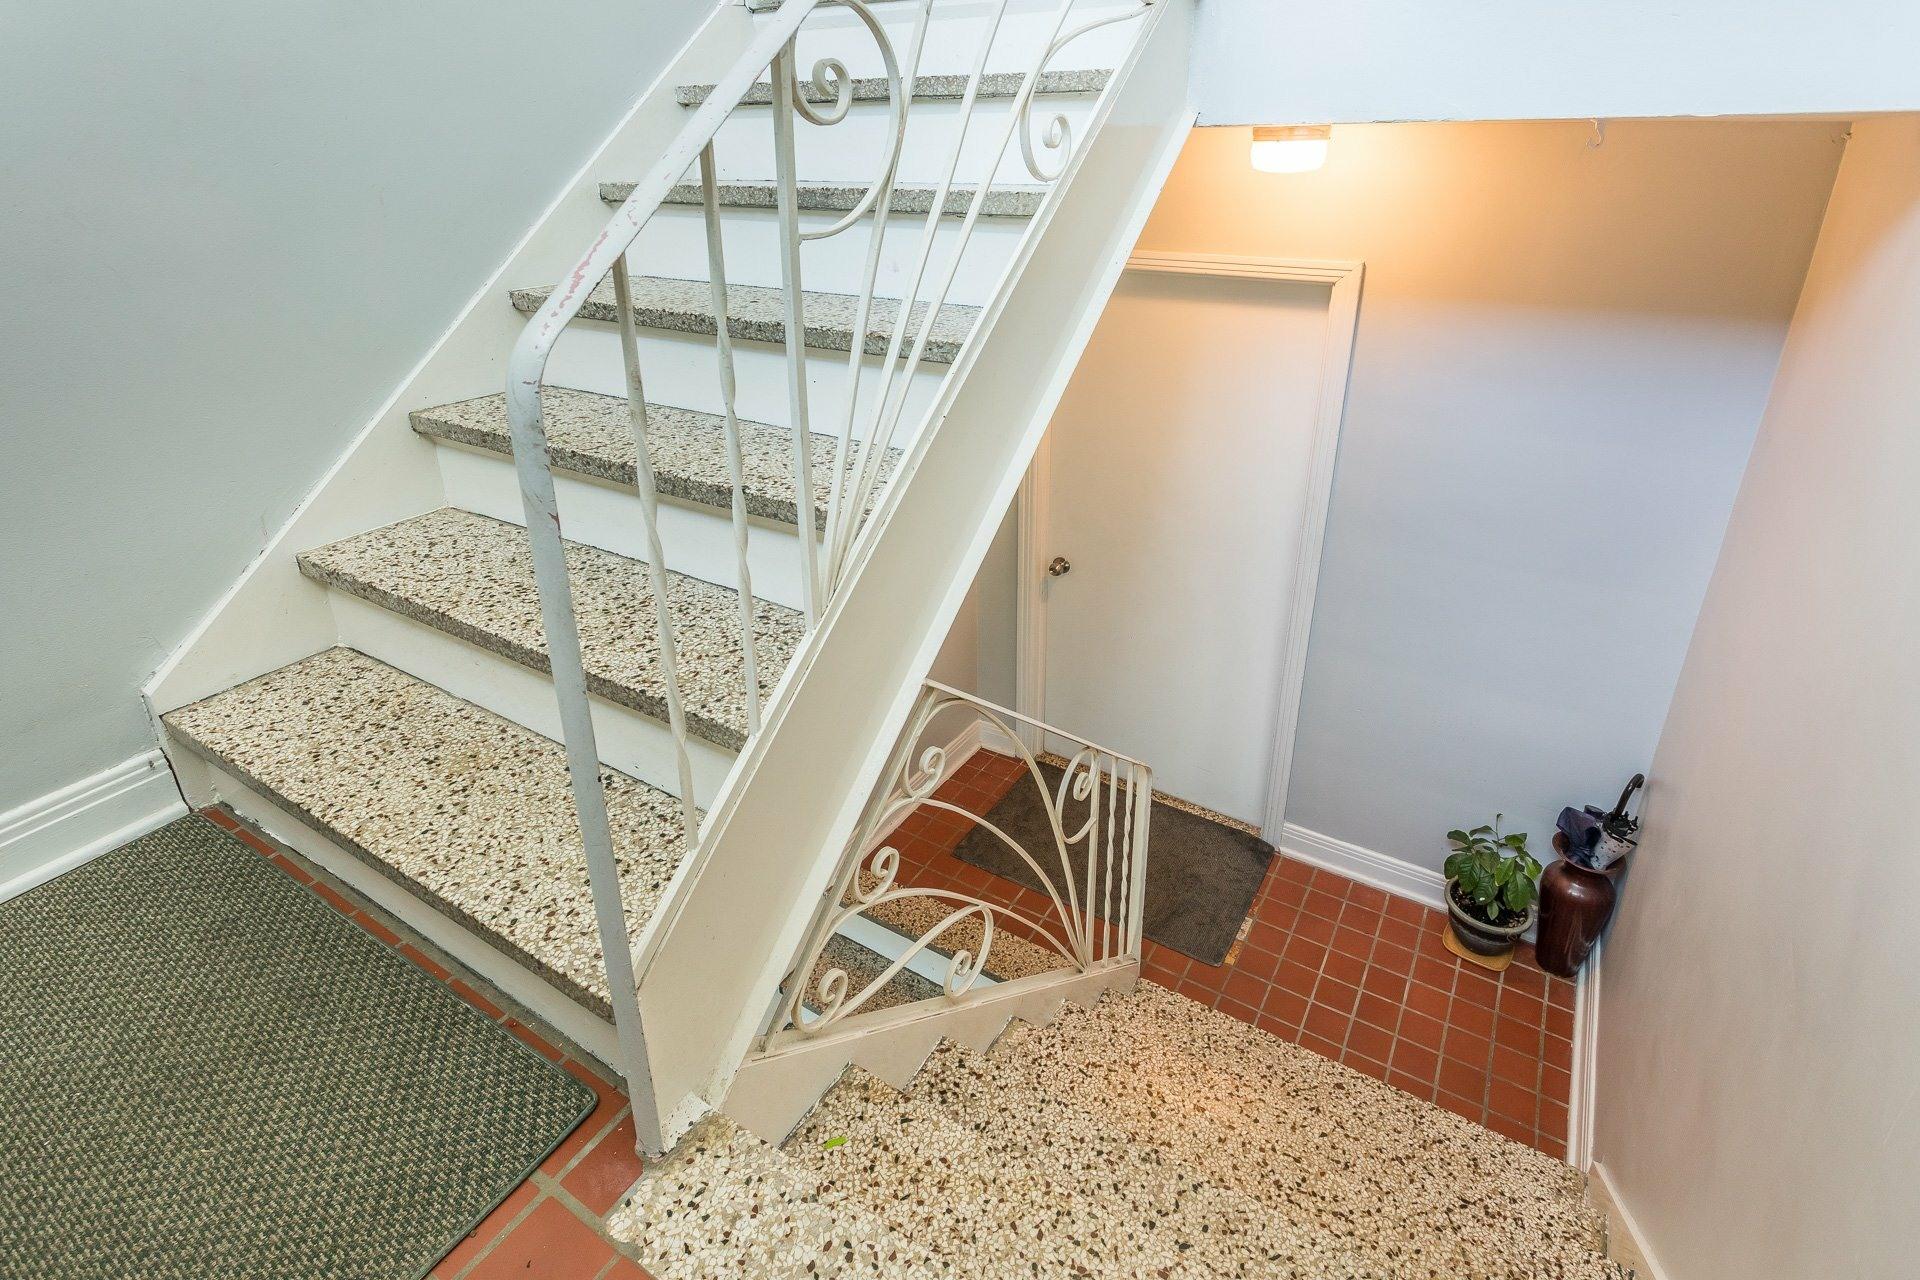 image 20 - Duplex In Vendita Ahuntsic-Cartierville Montréal  - 8 stanze